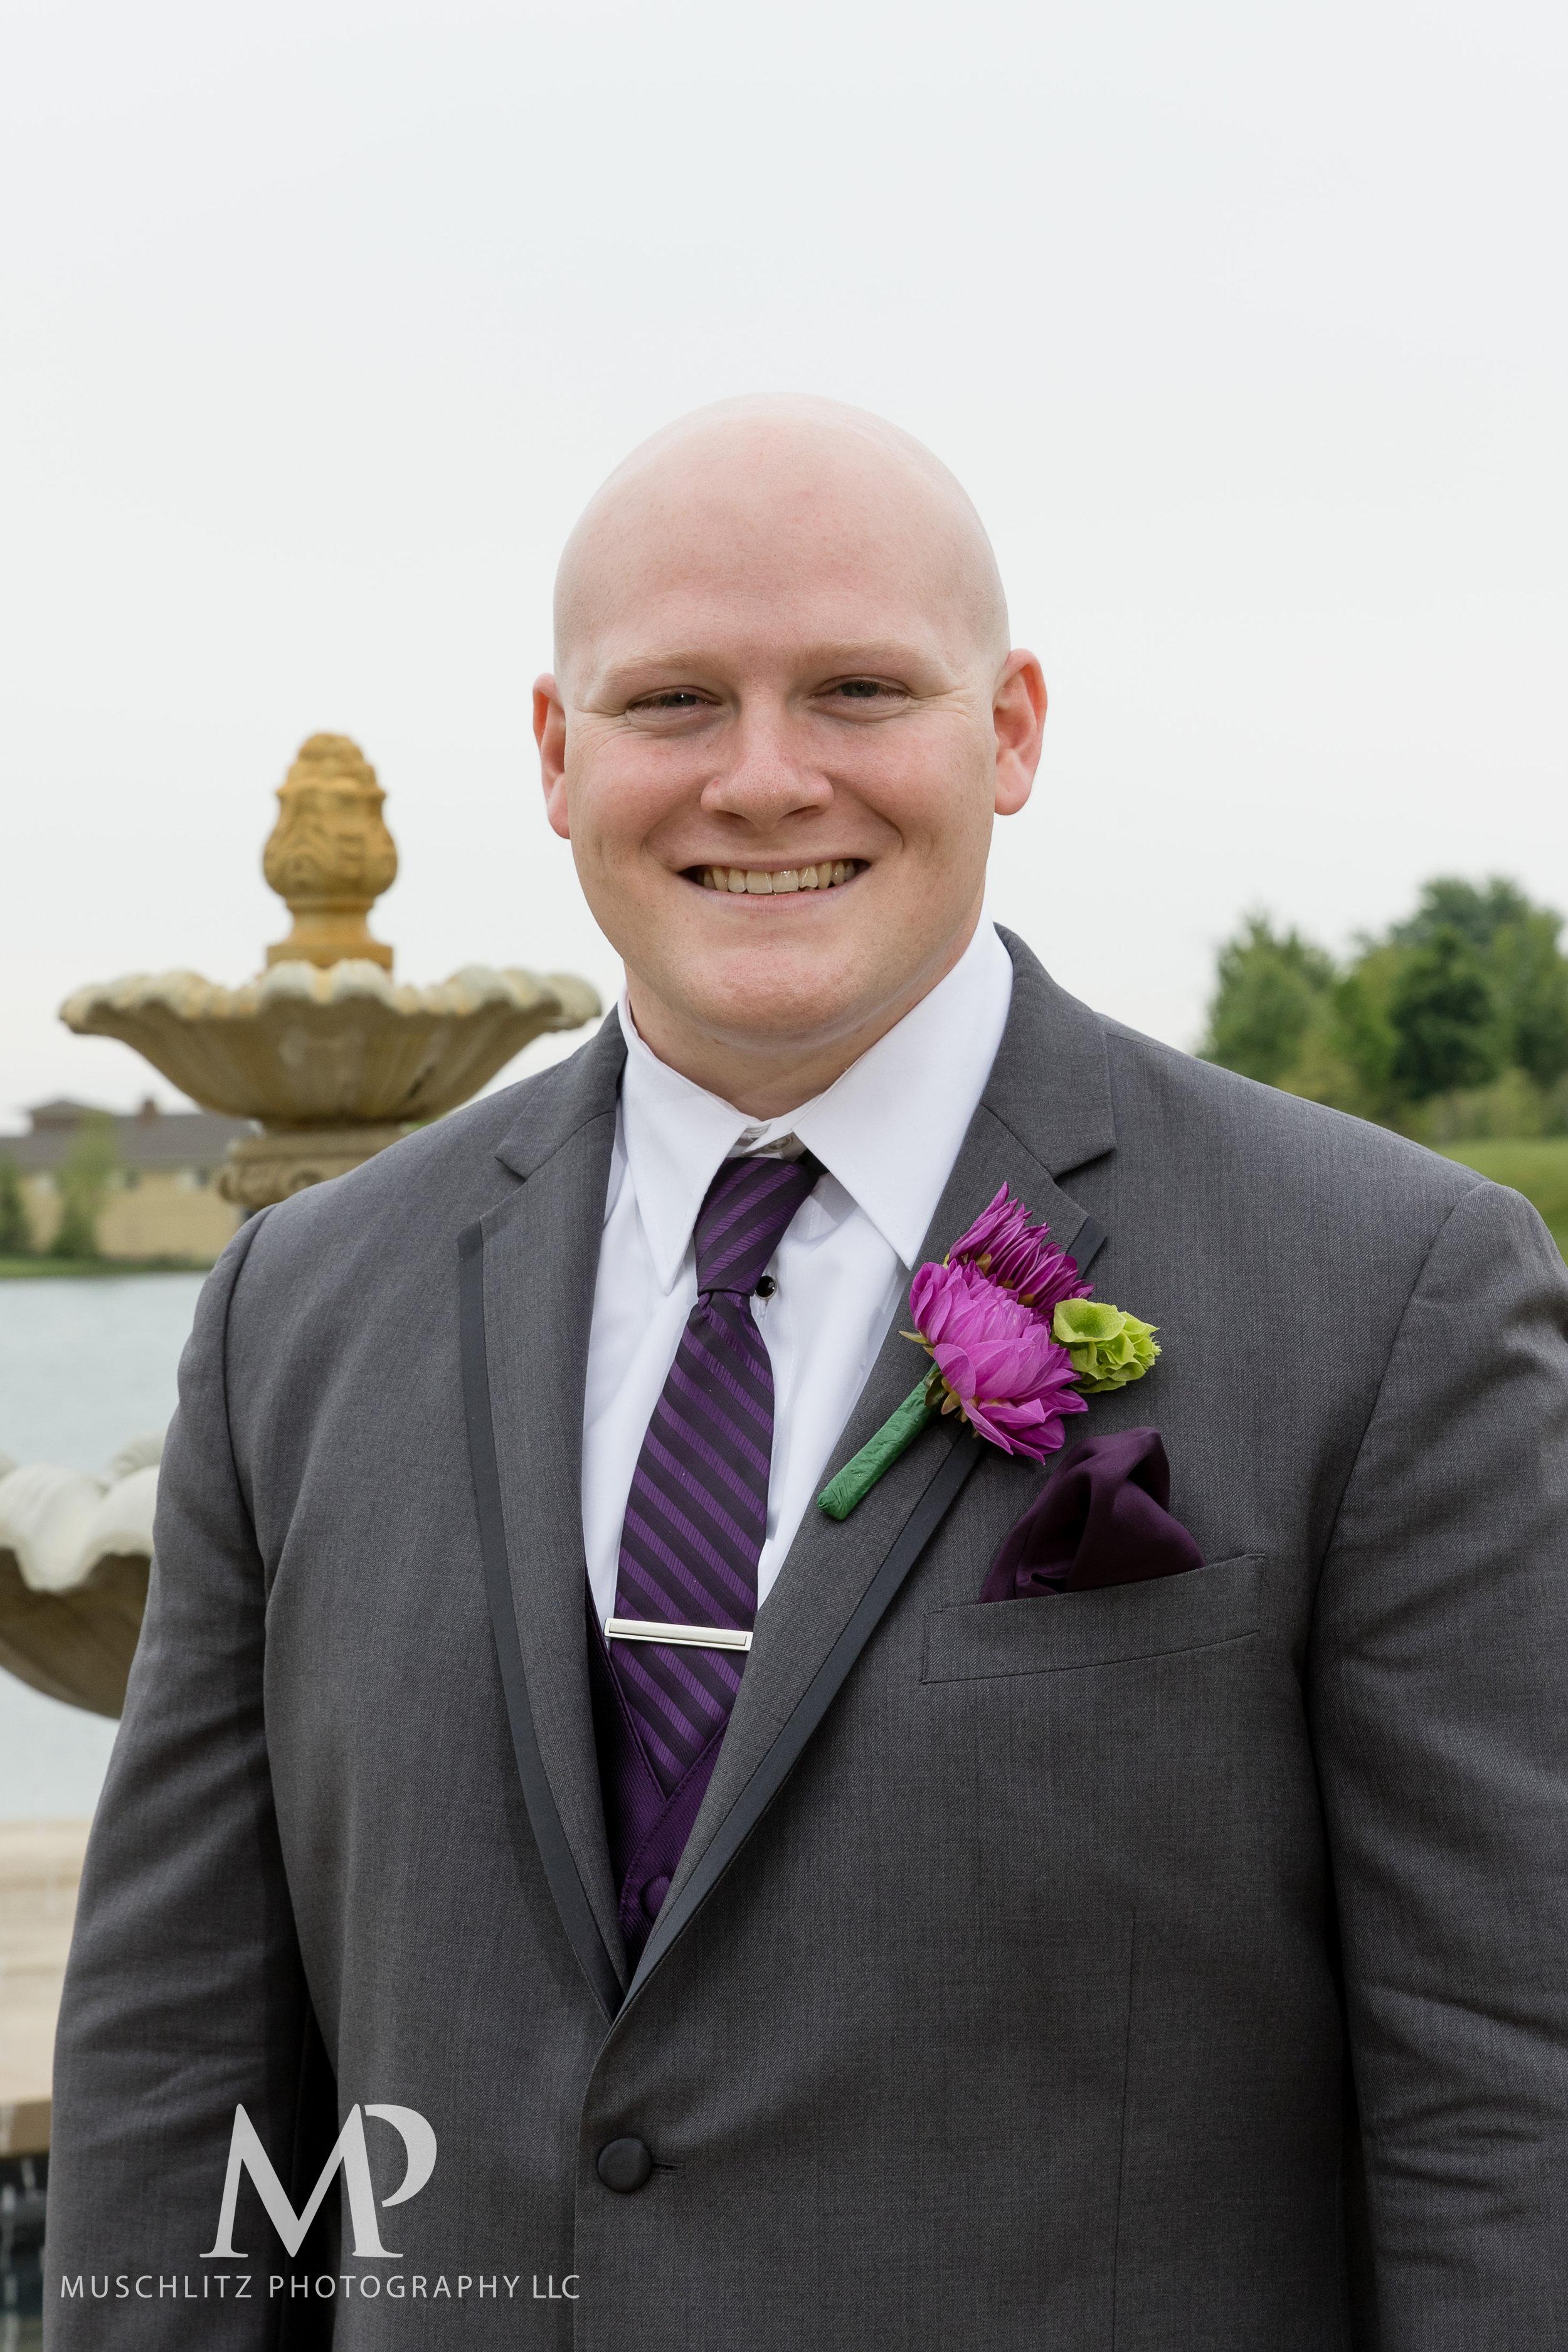 club-at-corazon-wedding-ceremony-reception-columbus-dublin-ohio-ohio-university-theme-047.JPG